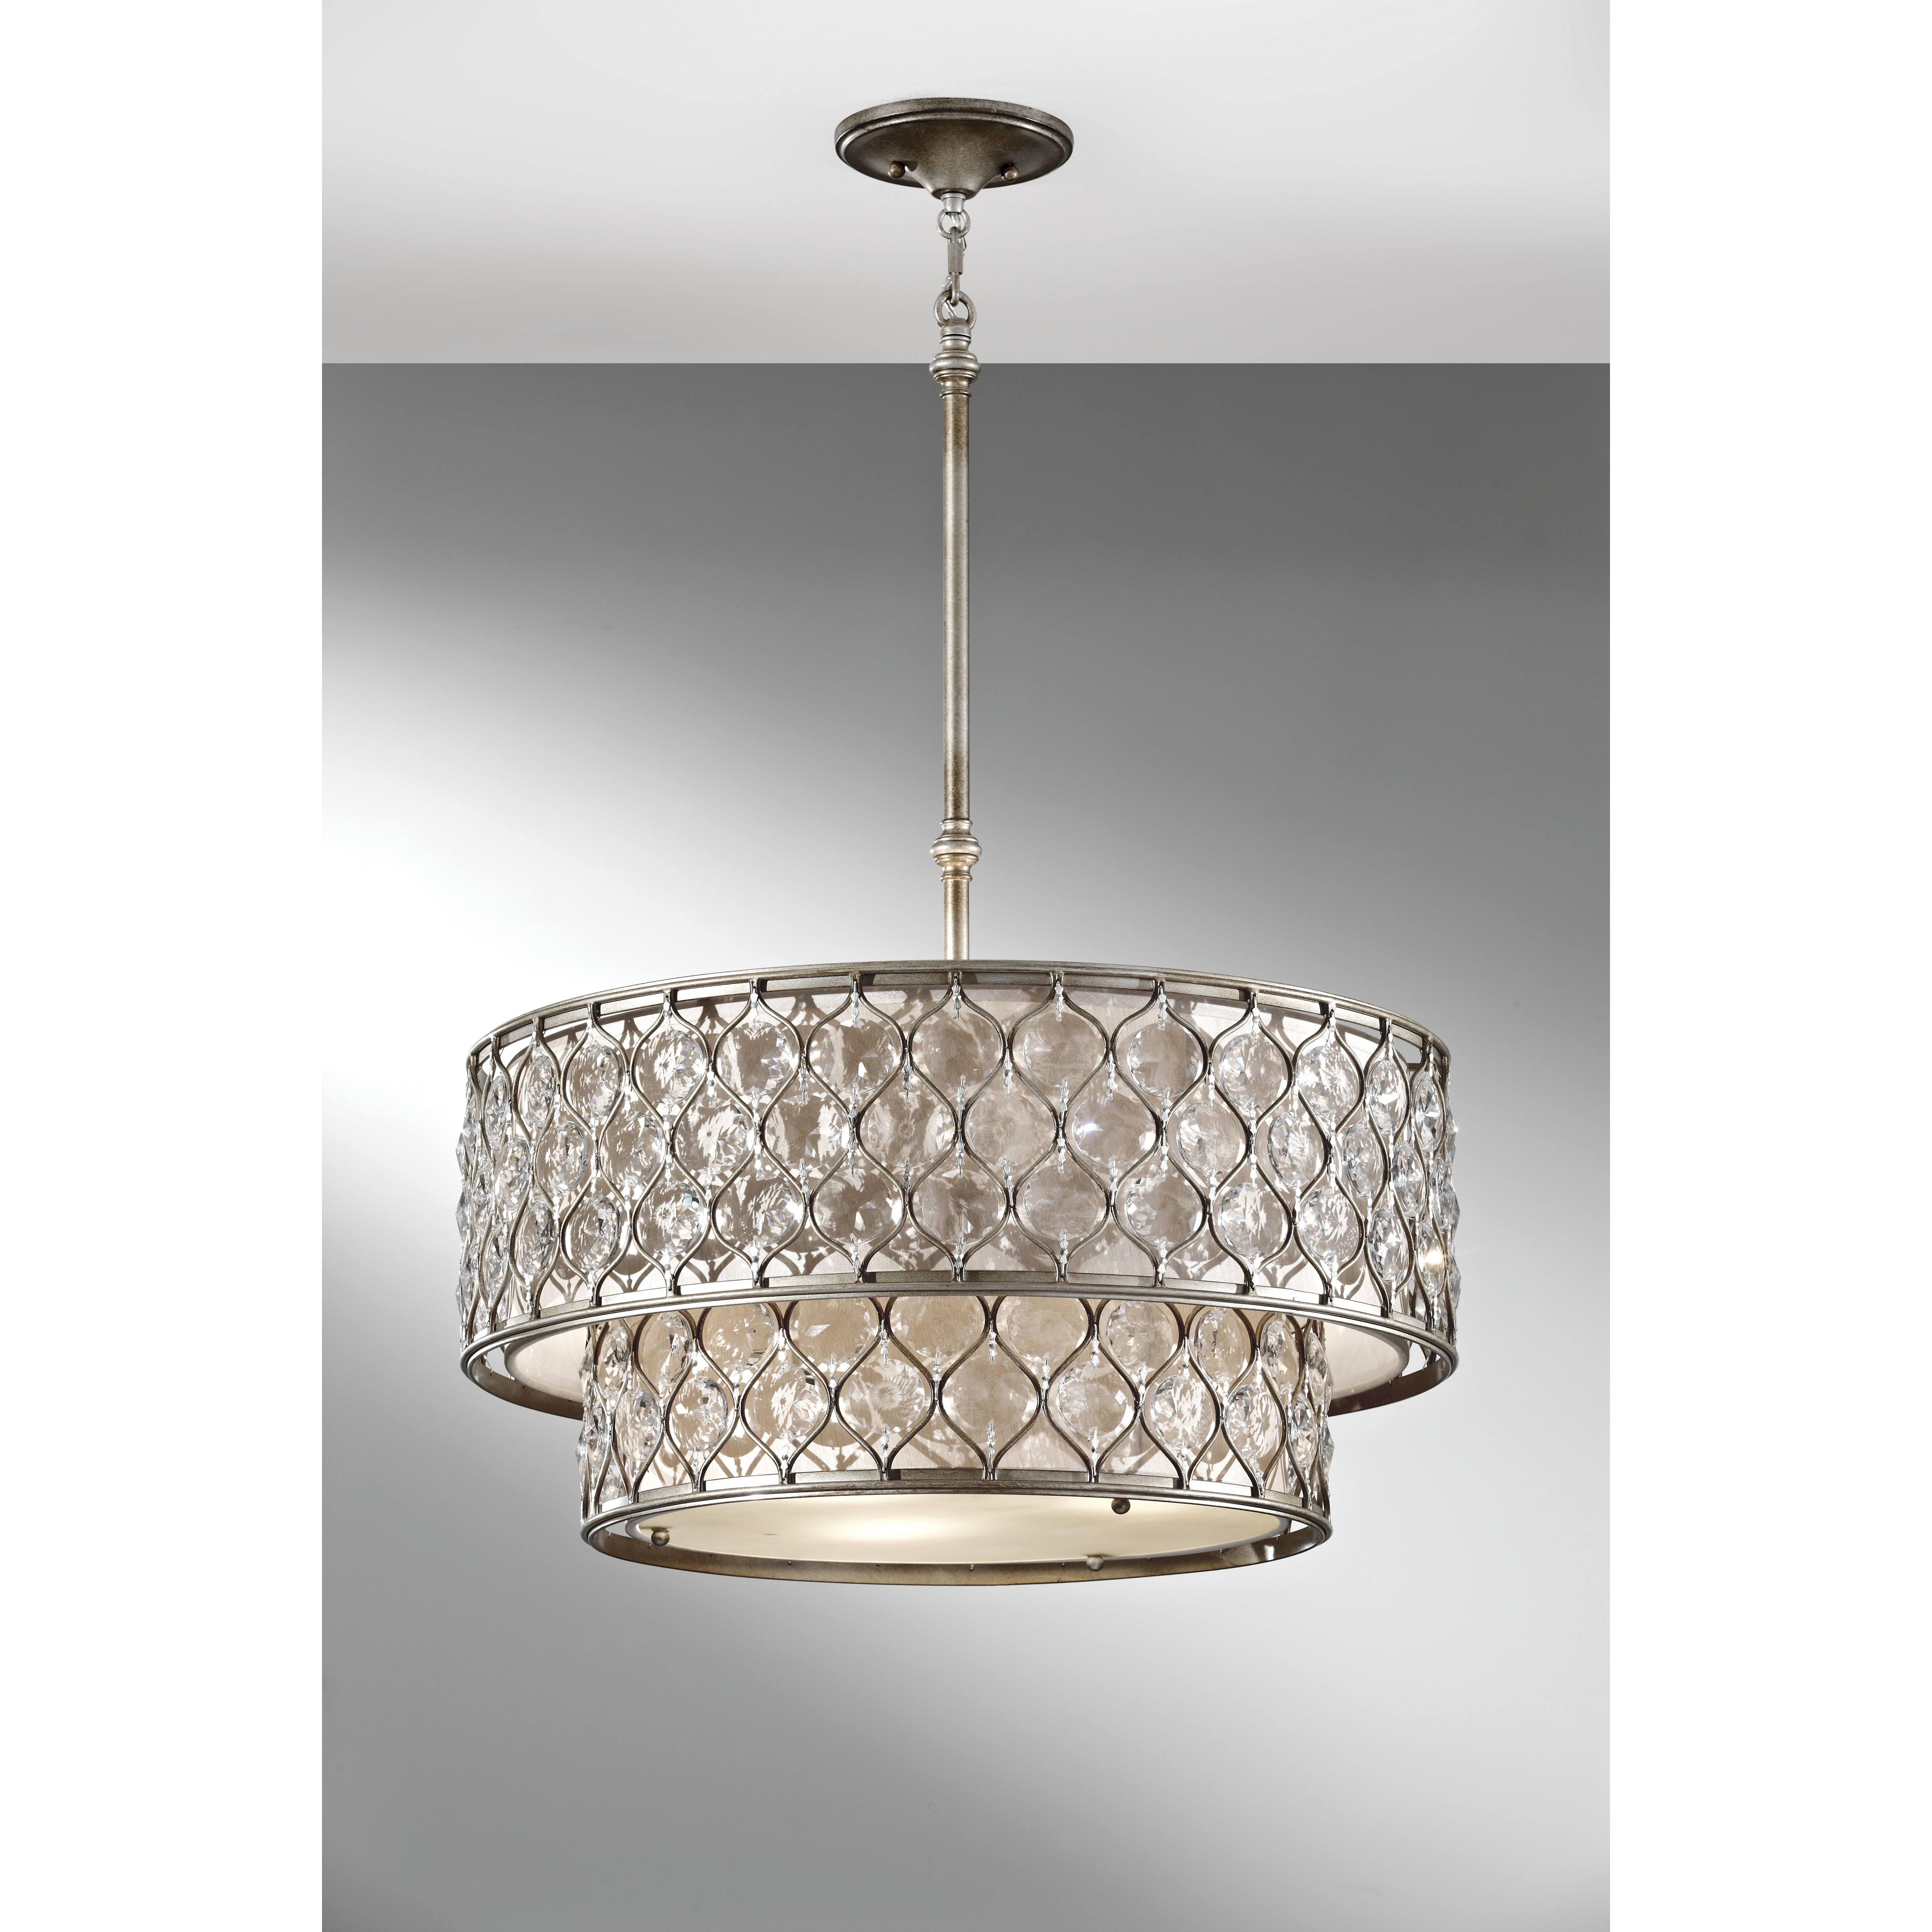 House Of Hampton Honora 6 Light Drum Chandelier